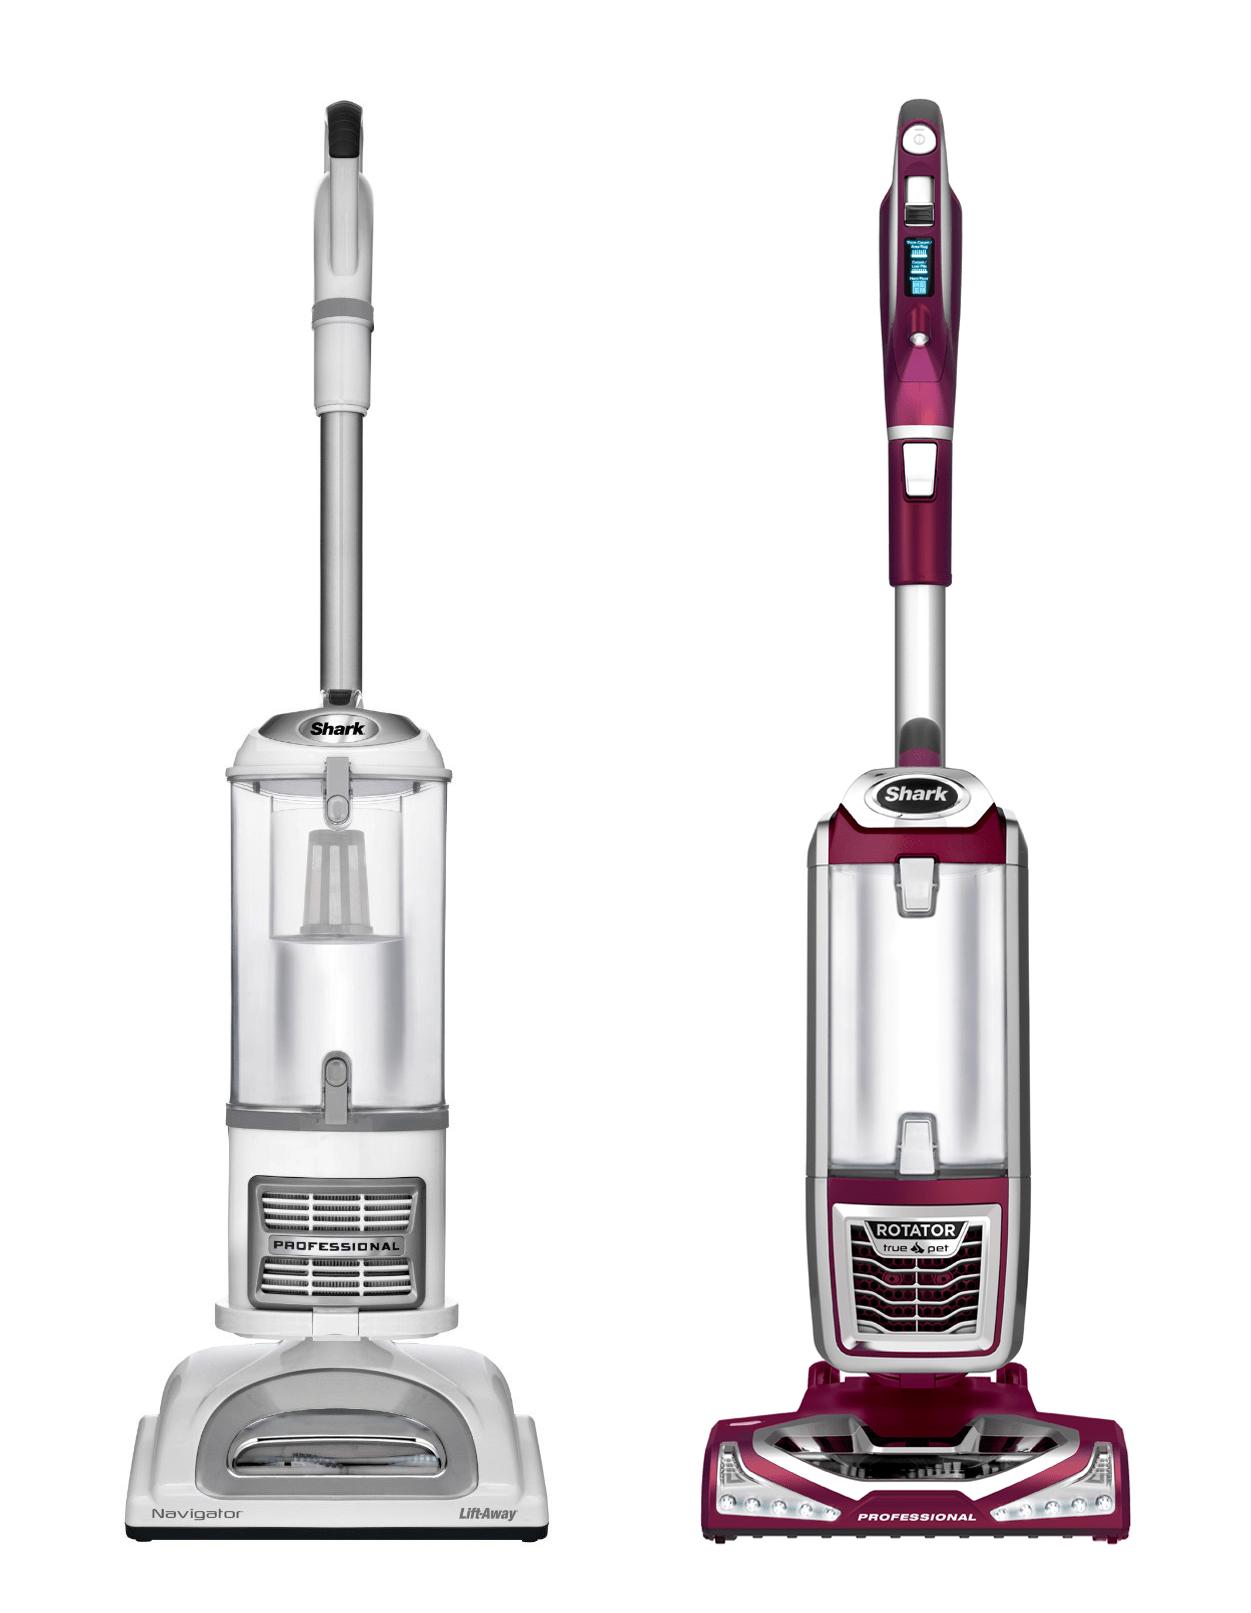 Shark Vacuum Models >> Shark Navigator Vs Rotator Who Wins The Vacuum Lover S Favor